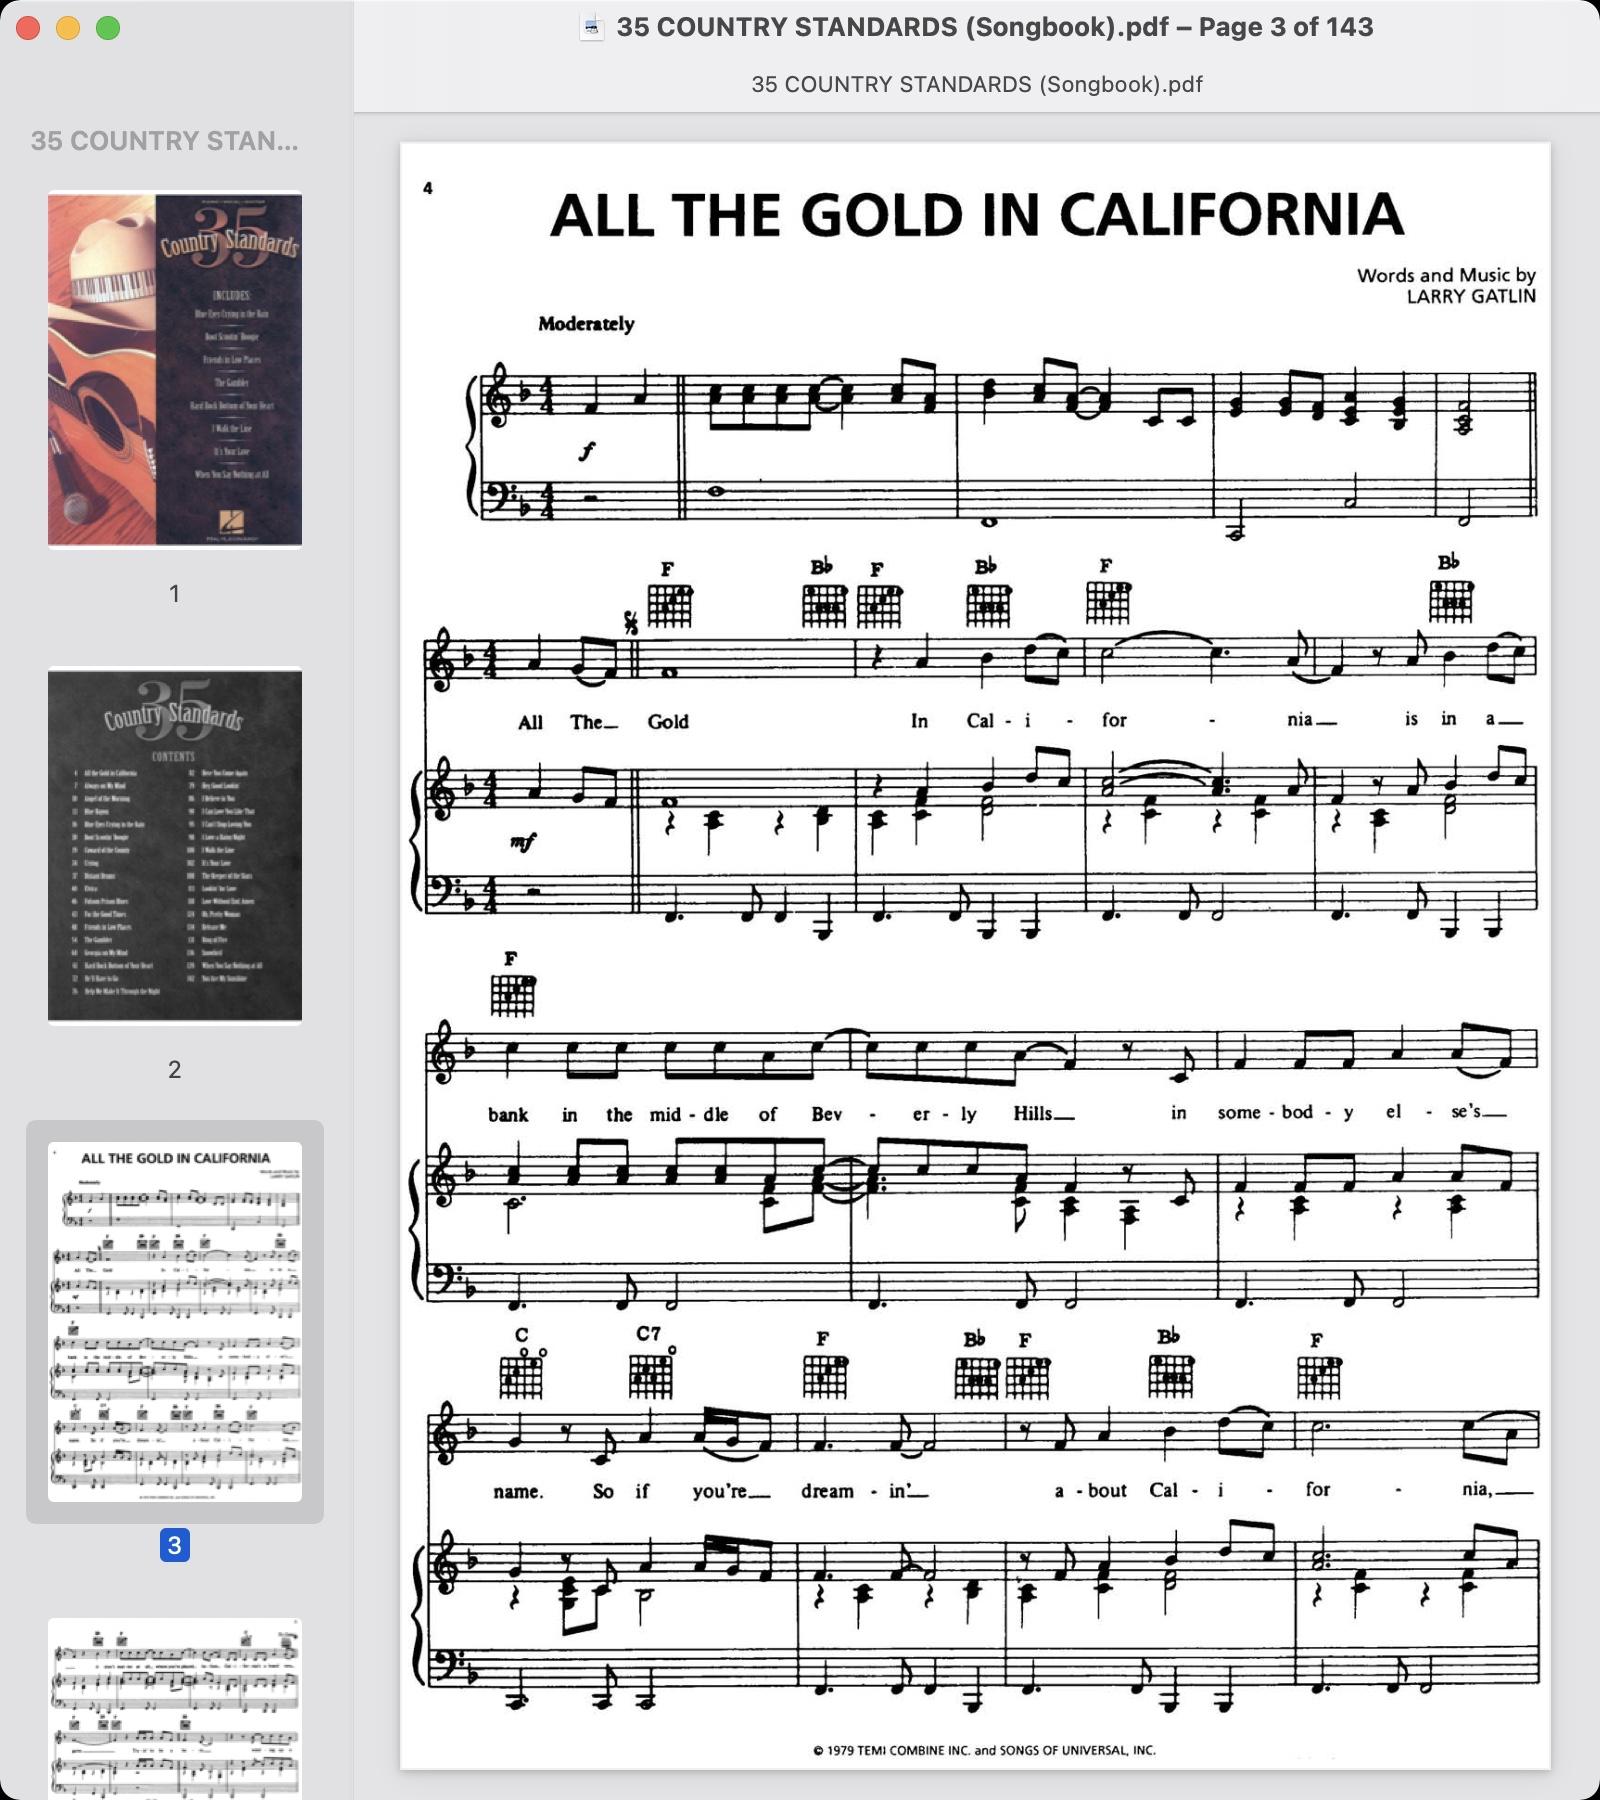 35 COUNTRY STANDARDS (Songbook).jpg